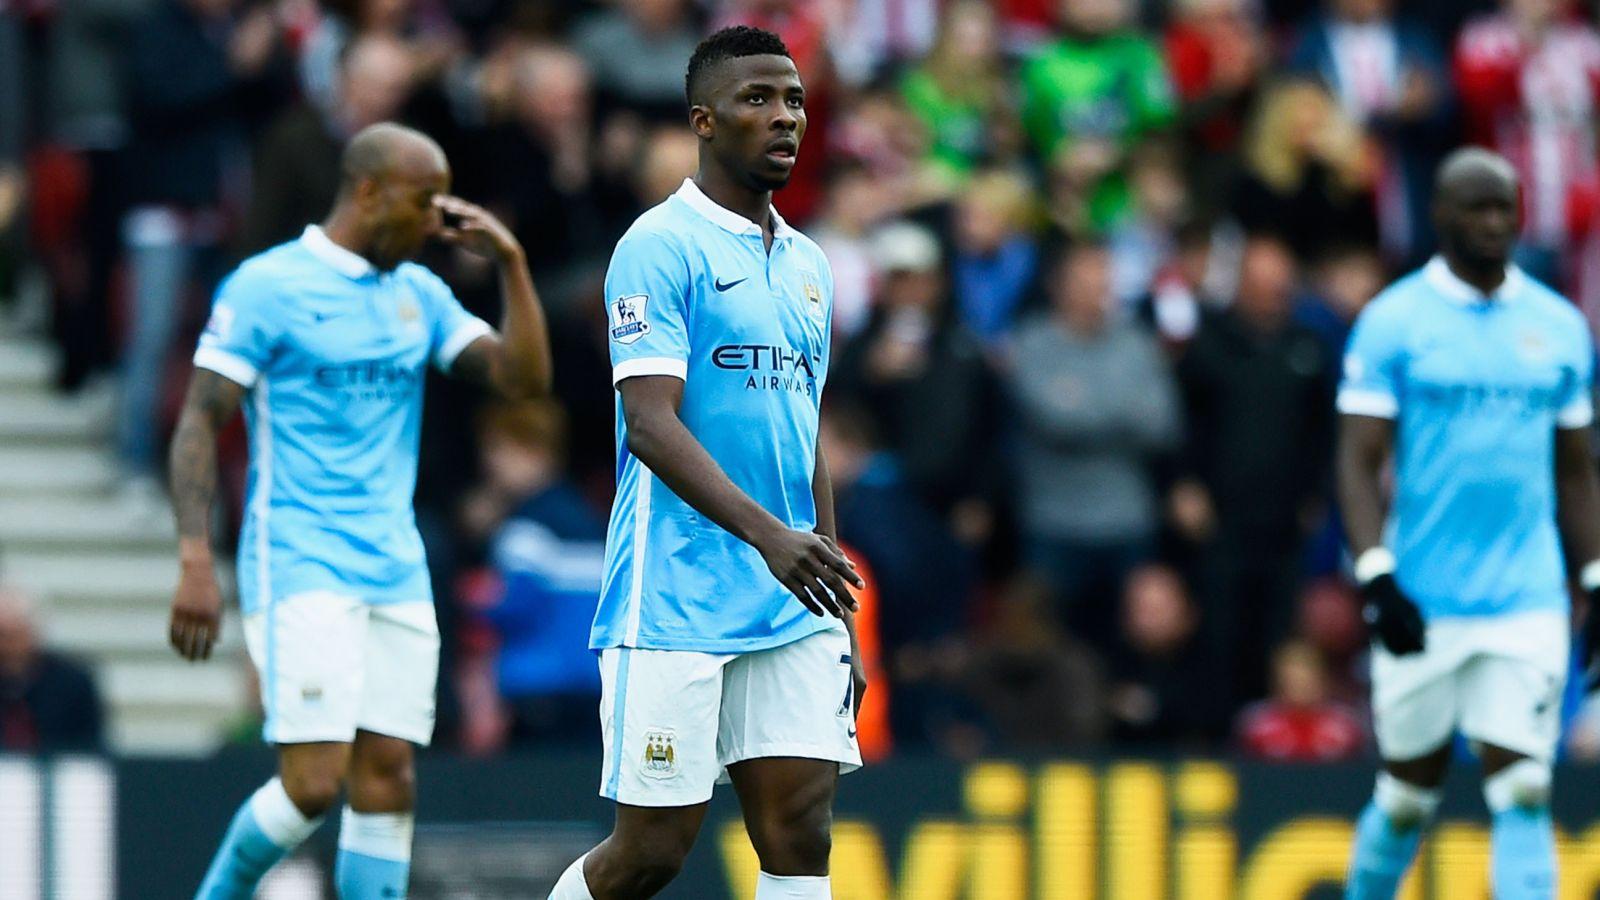 Defeat has damaged Man City's confidence, says Iheanacho